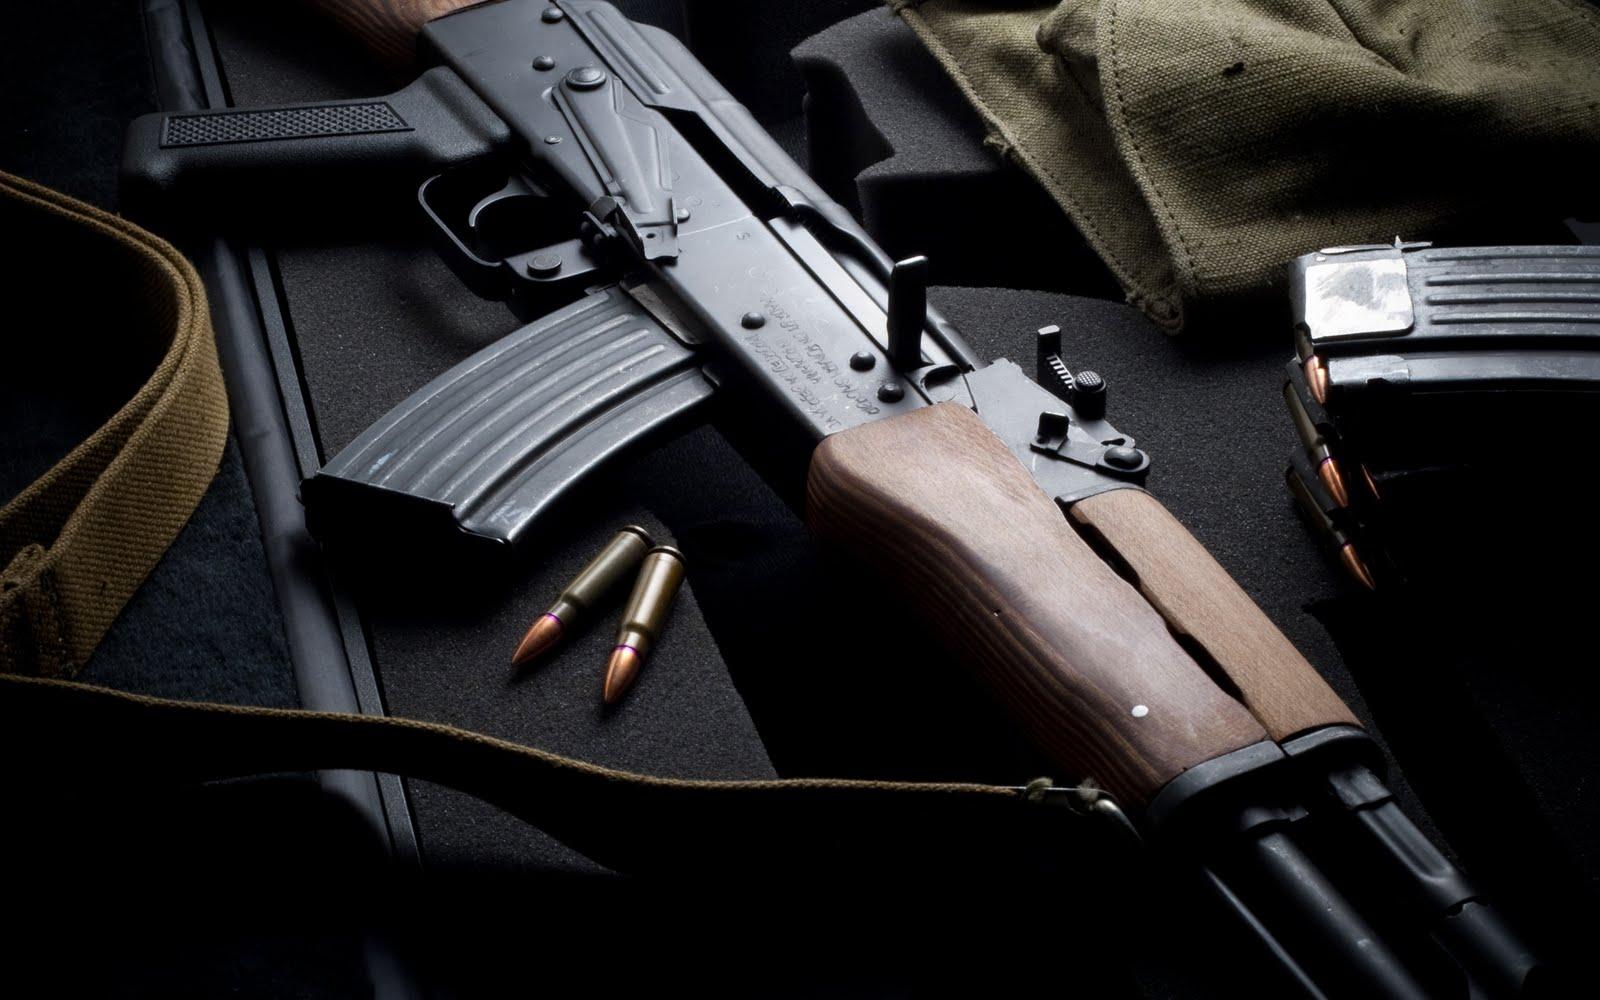 http://1.bp.blogspot.com/-yxruHq7XPmM/Tdwl4iyHLUI/AAAAAAAACLM/5NuFnz2LuX0/s1600/Kalashnikov.jpg